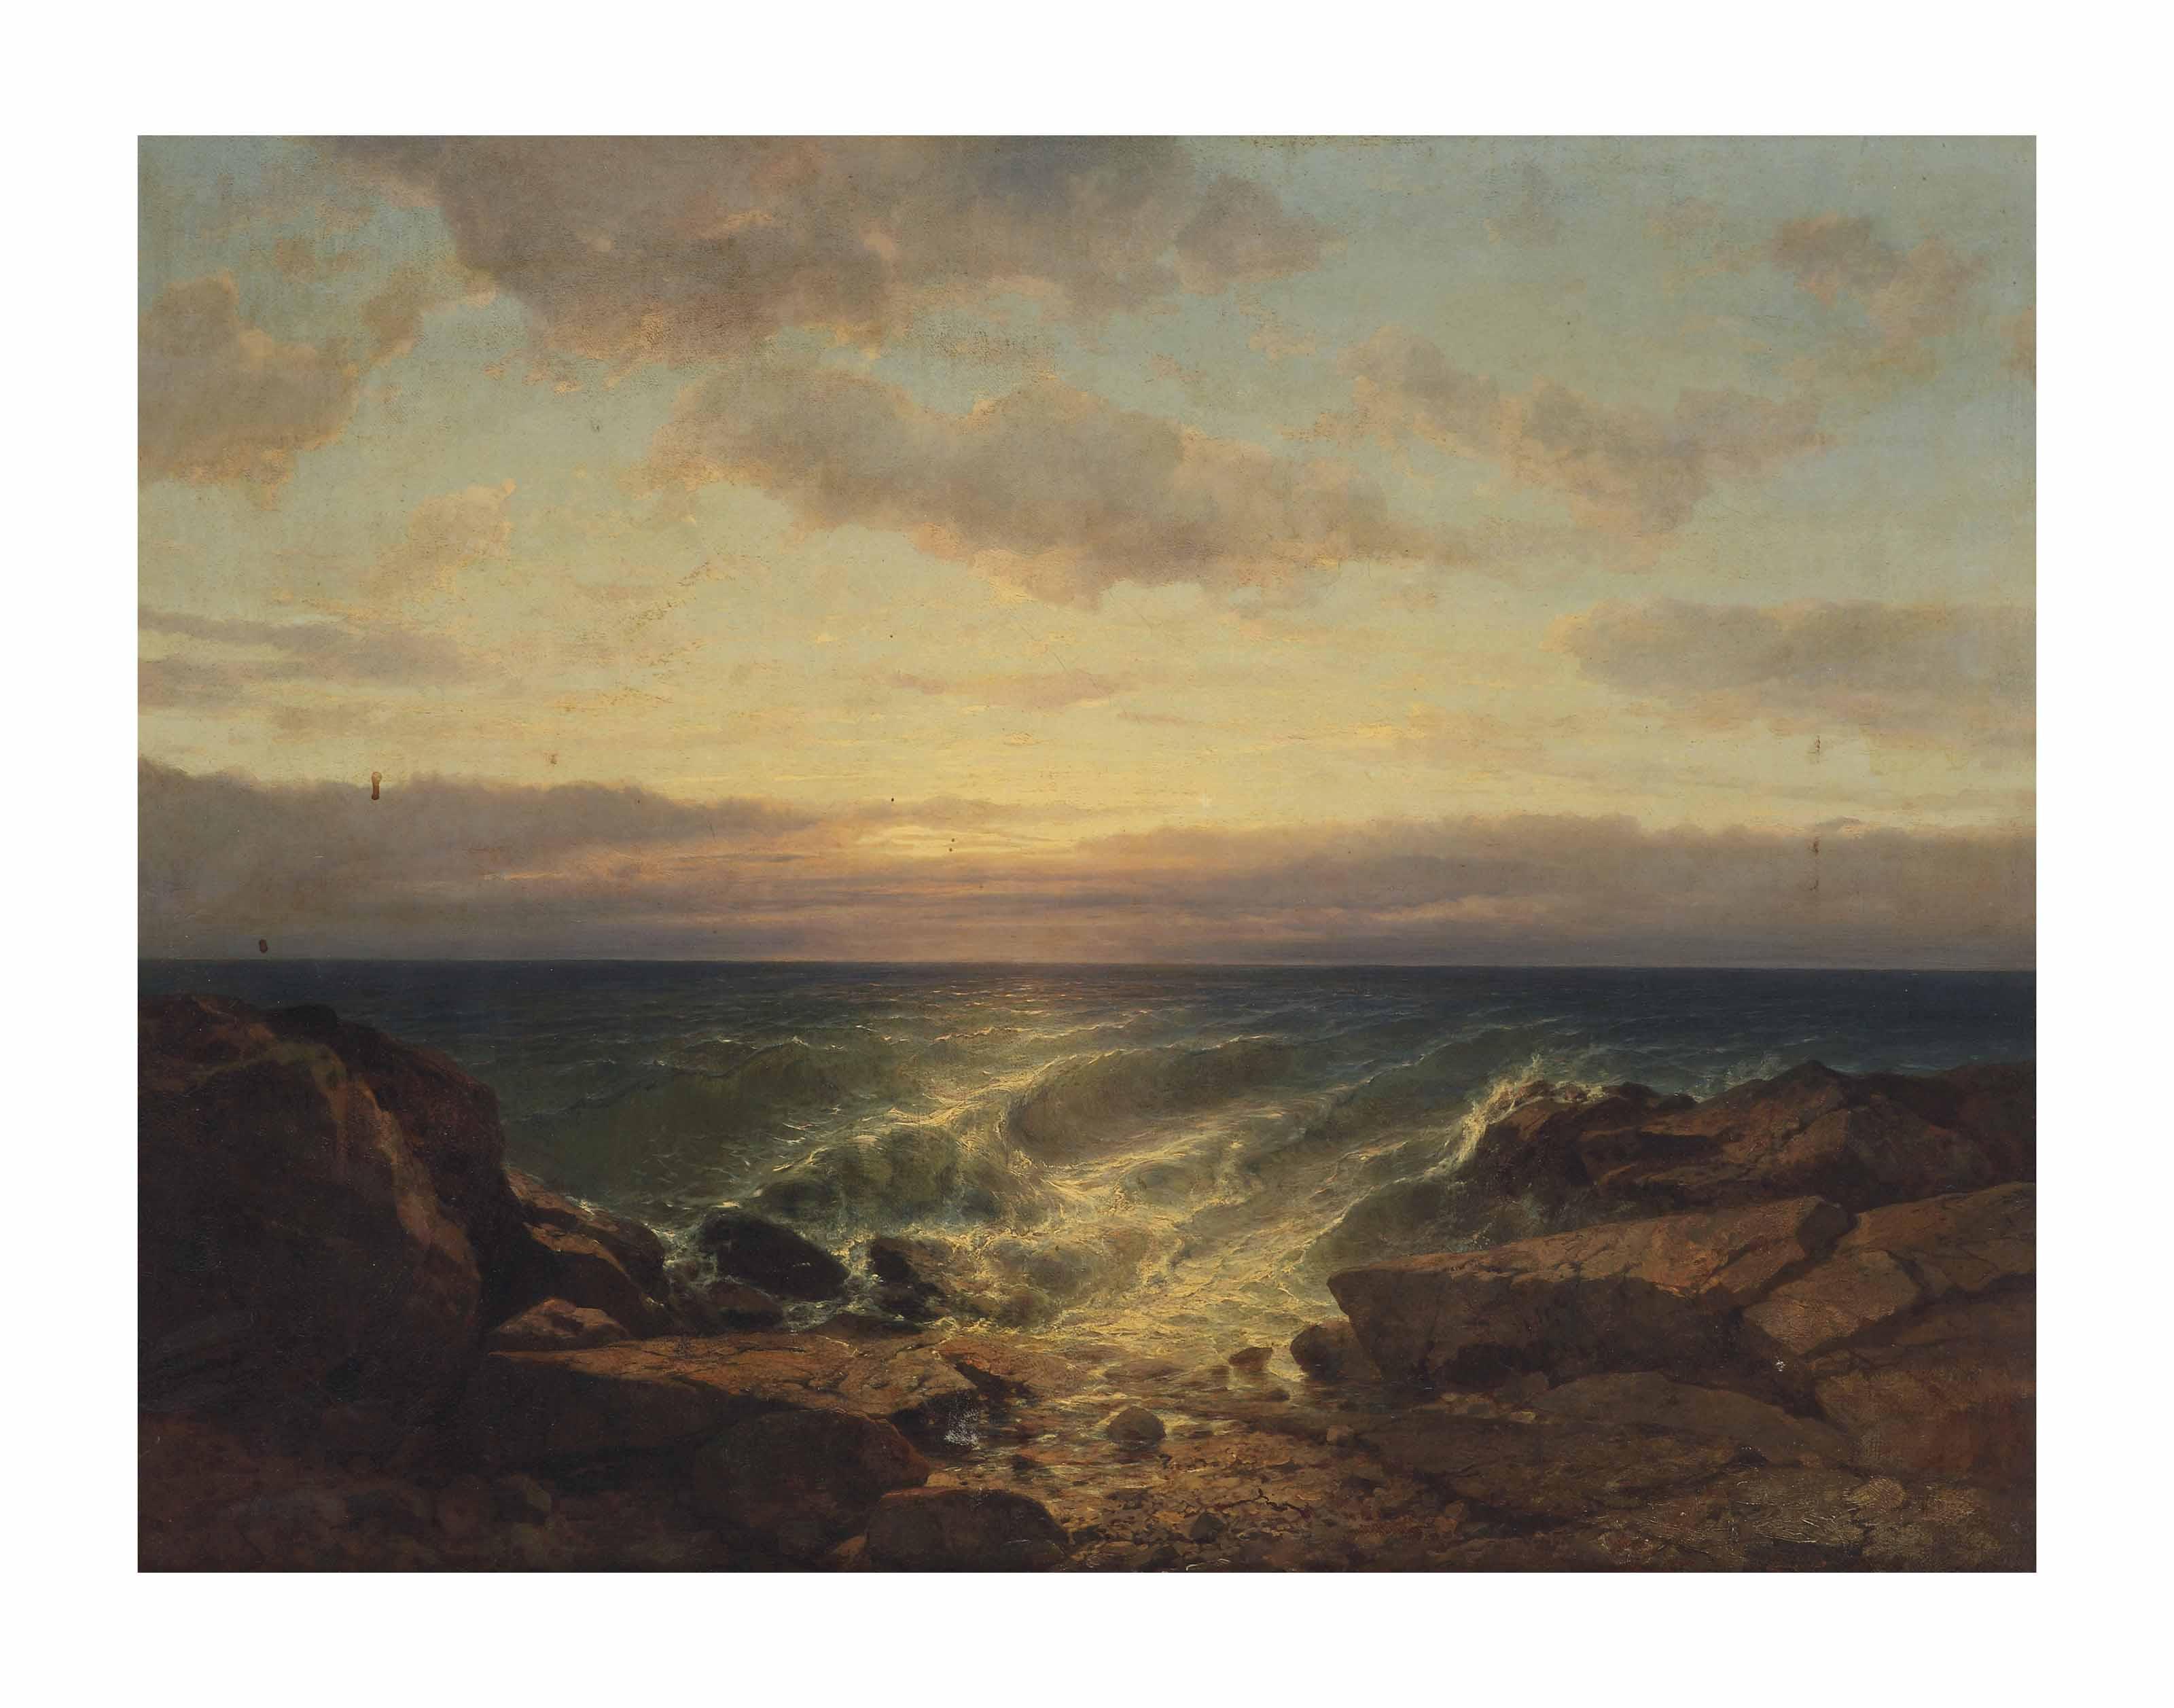 Marine: an approaching tide